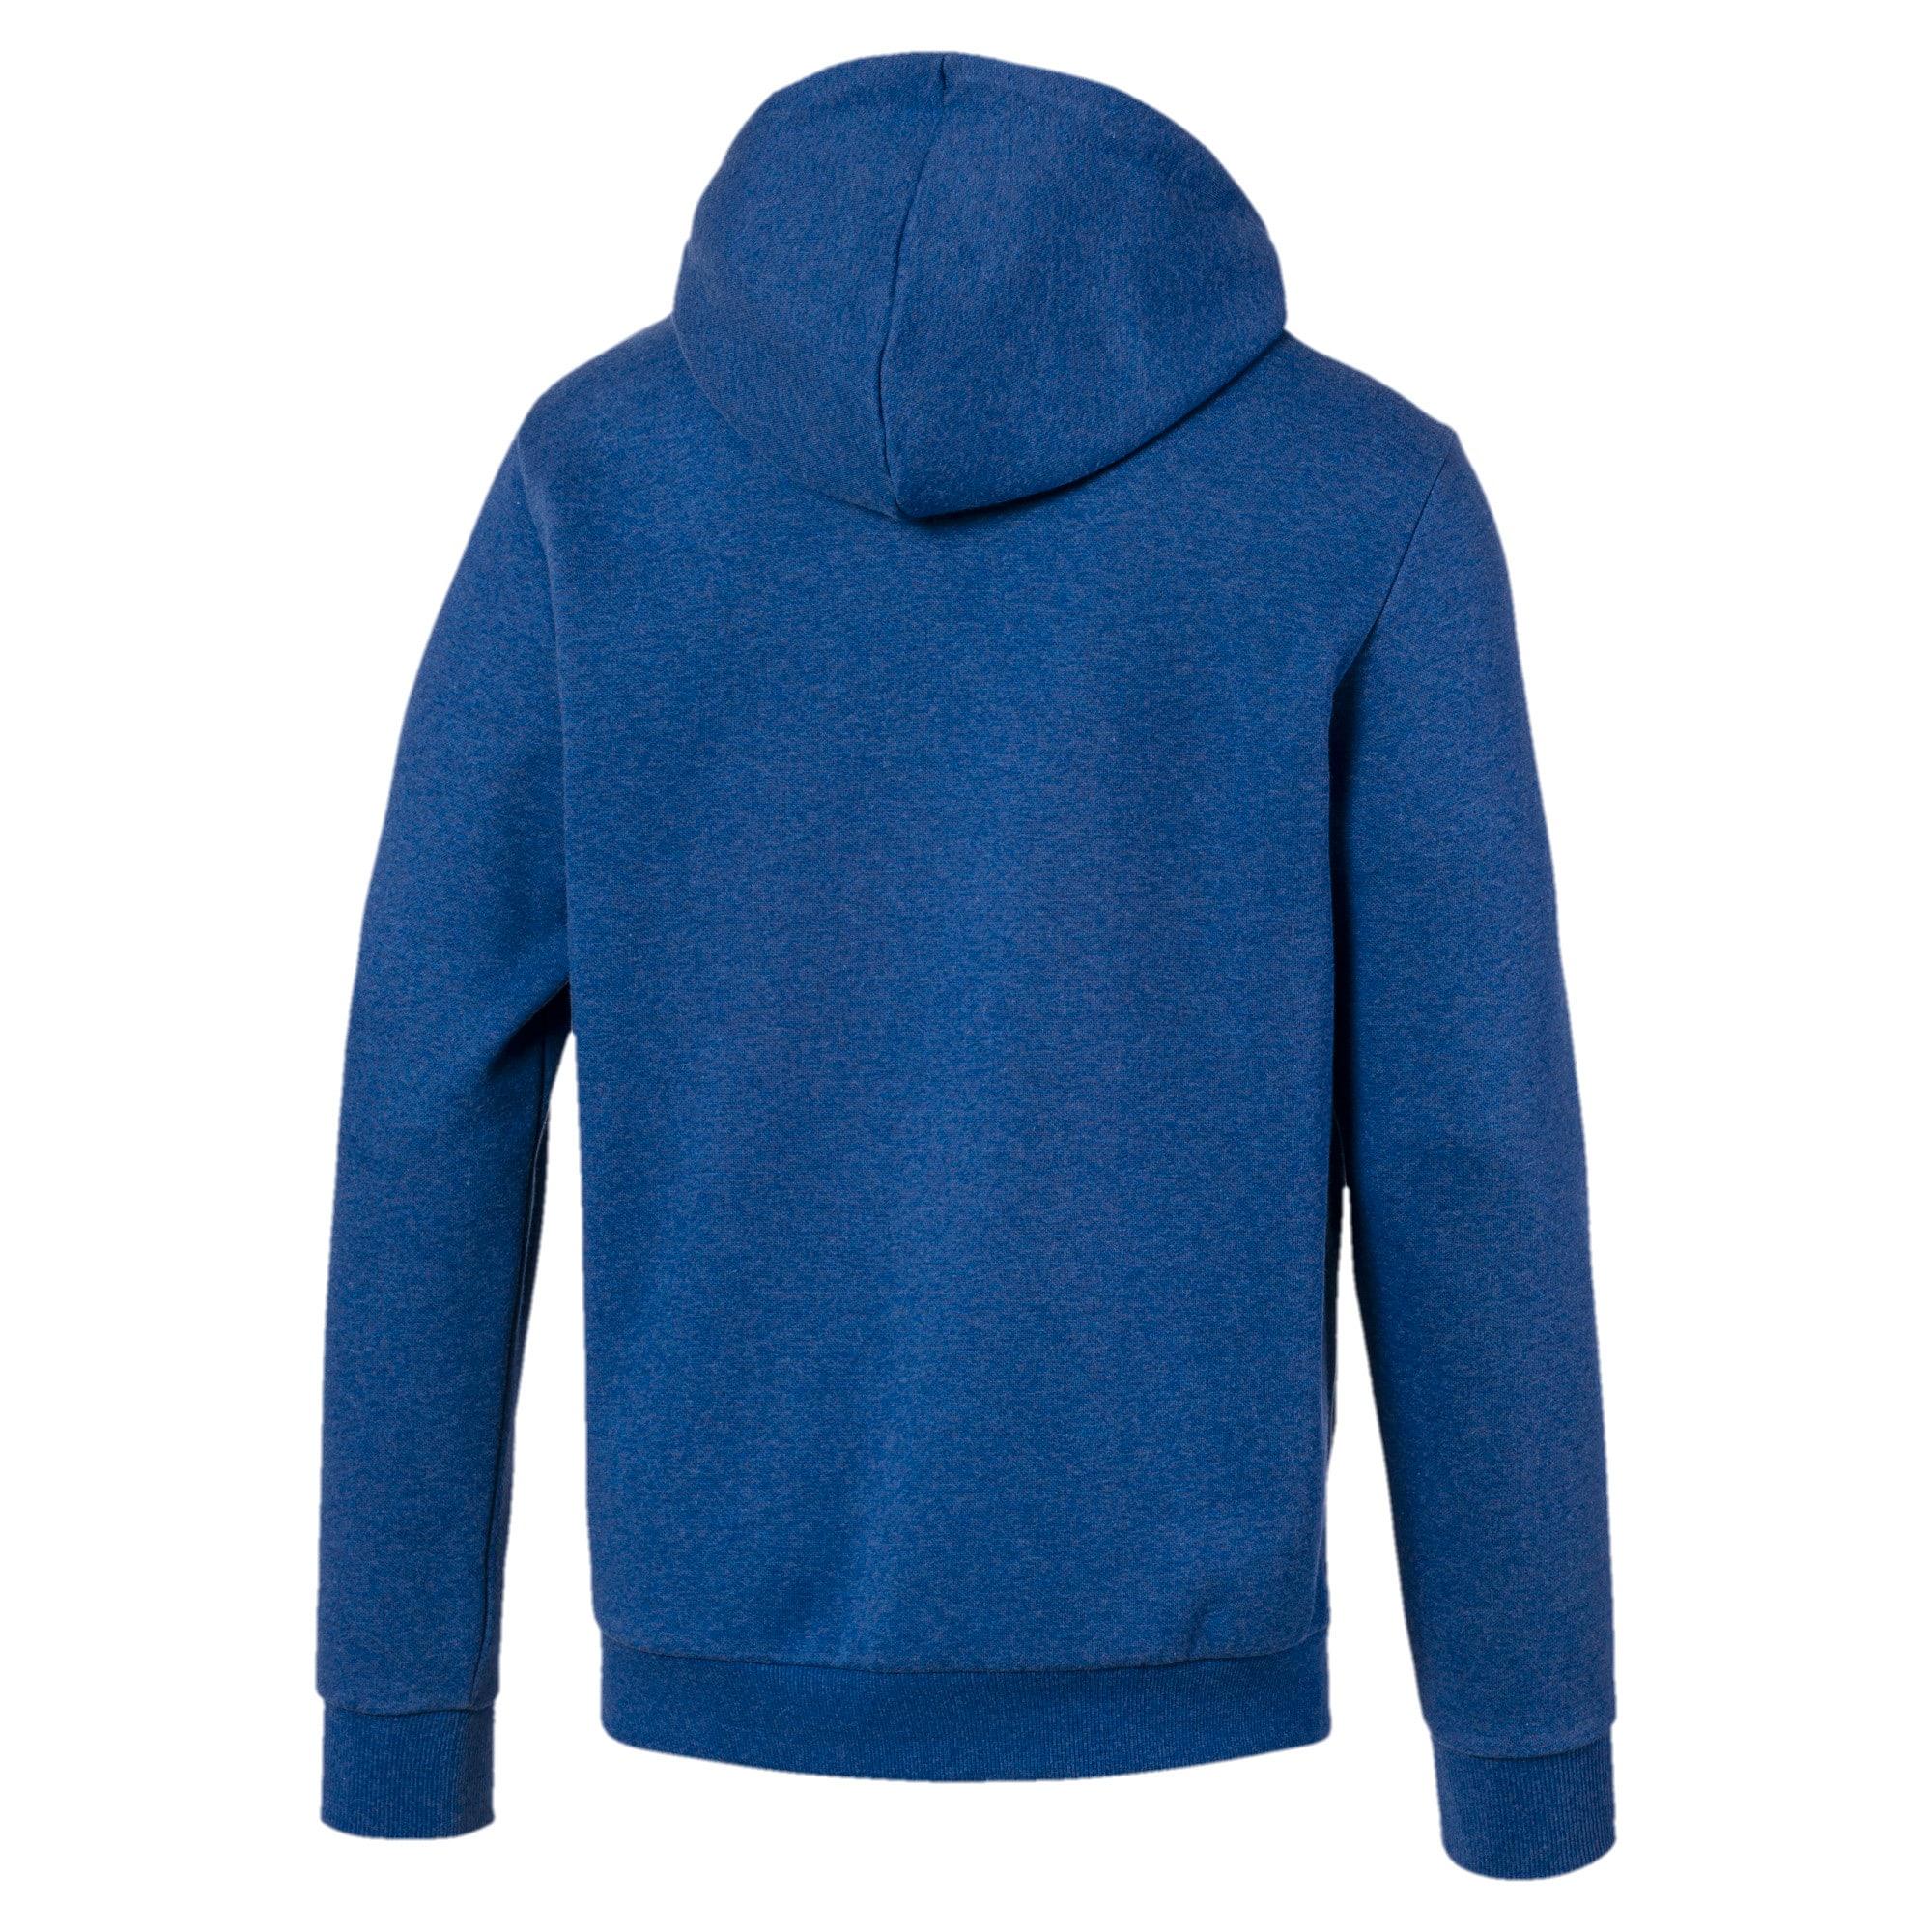 Thumbnail 5 of Essentials+ Men's Fleece Hoodie, Galaxy Blue Heather, medium